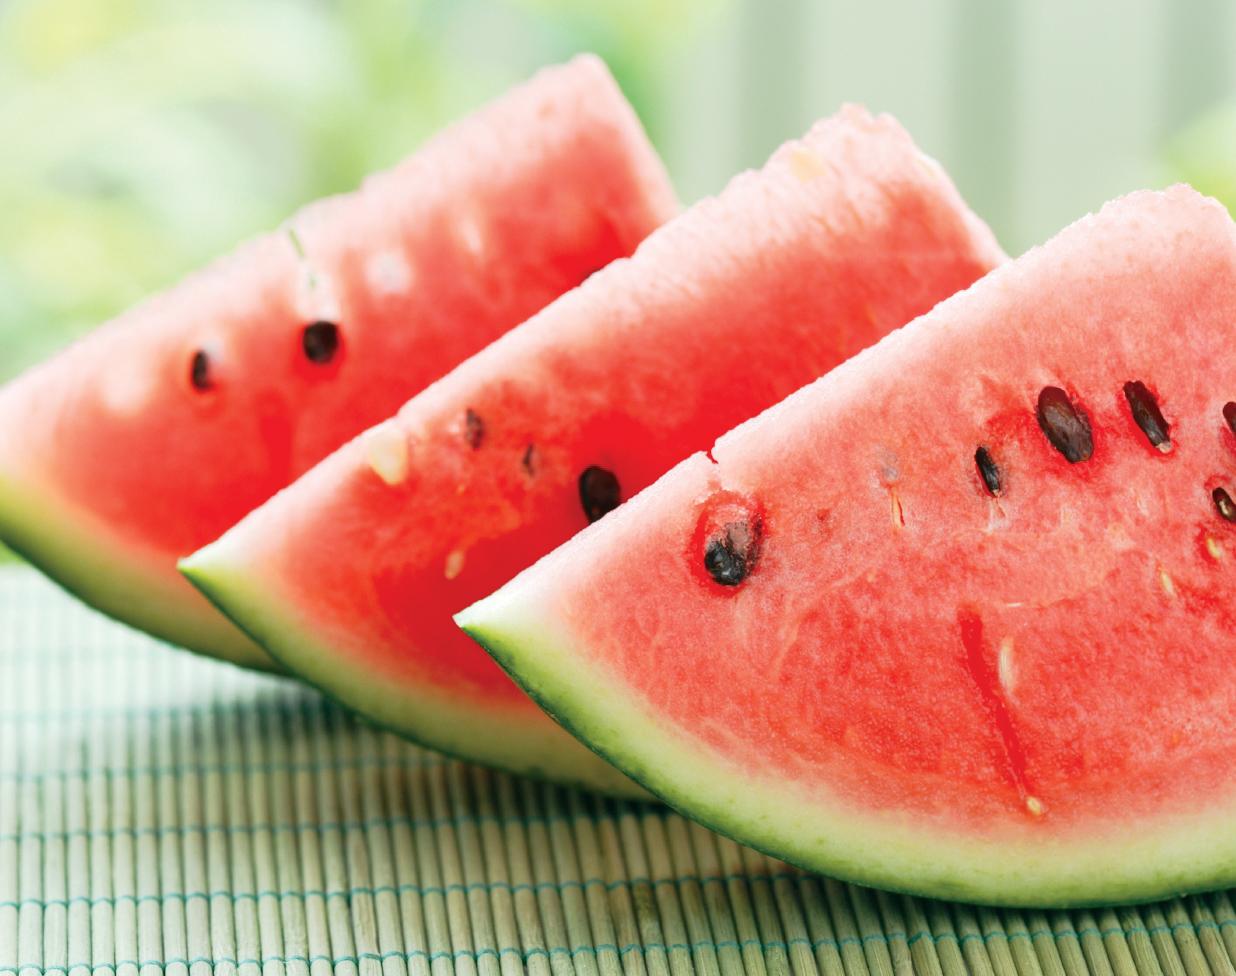 My Favorite Summer Fruit: Watermelon!